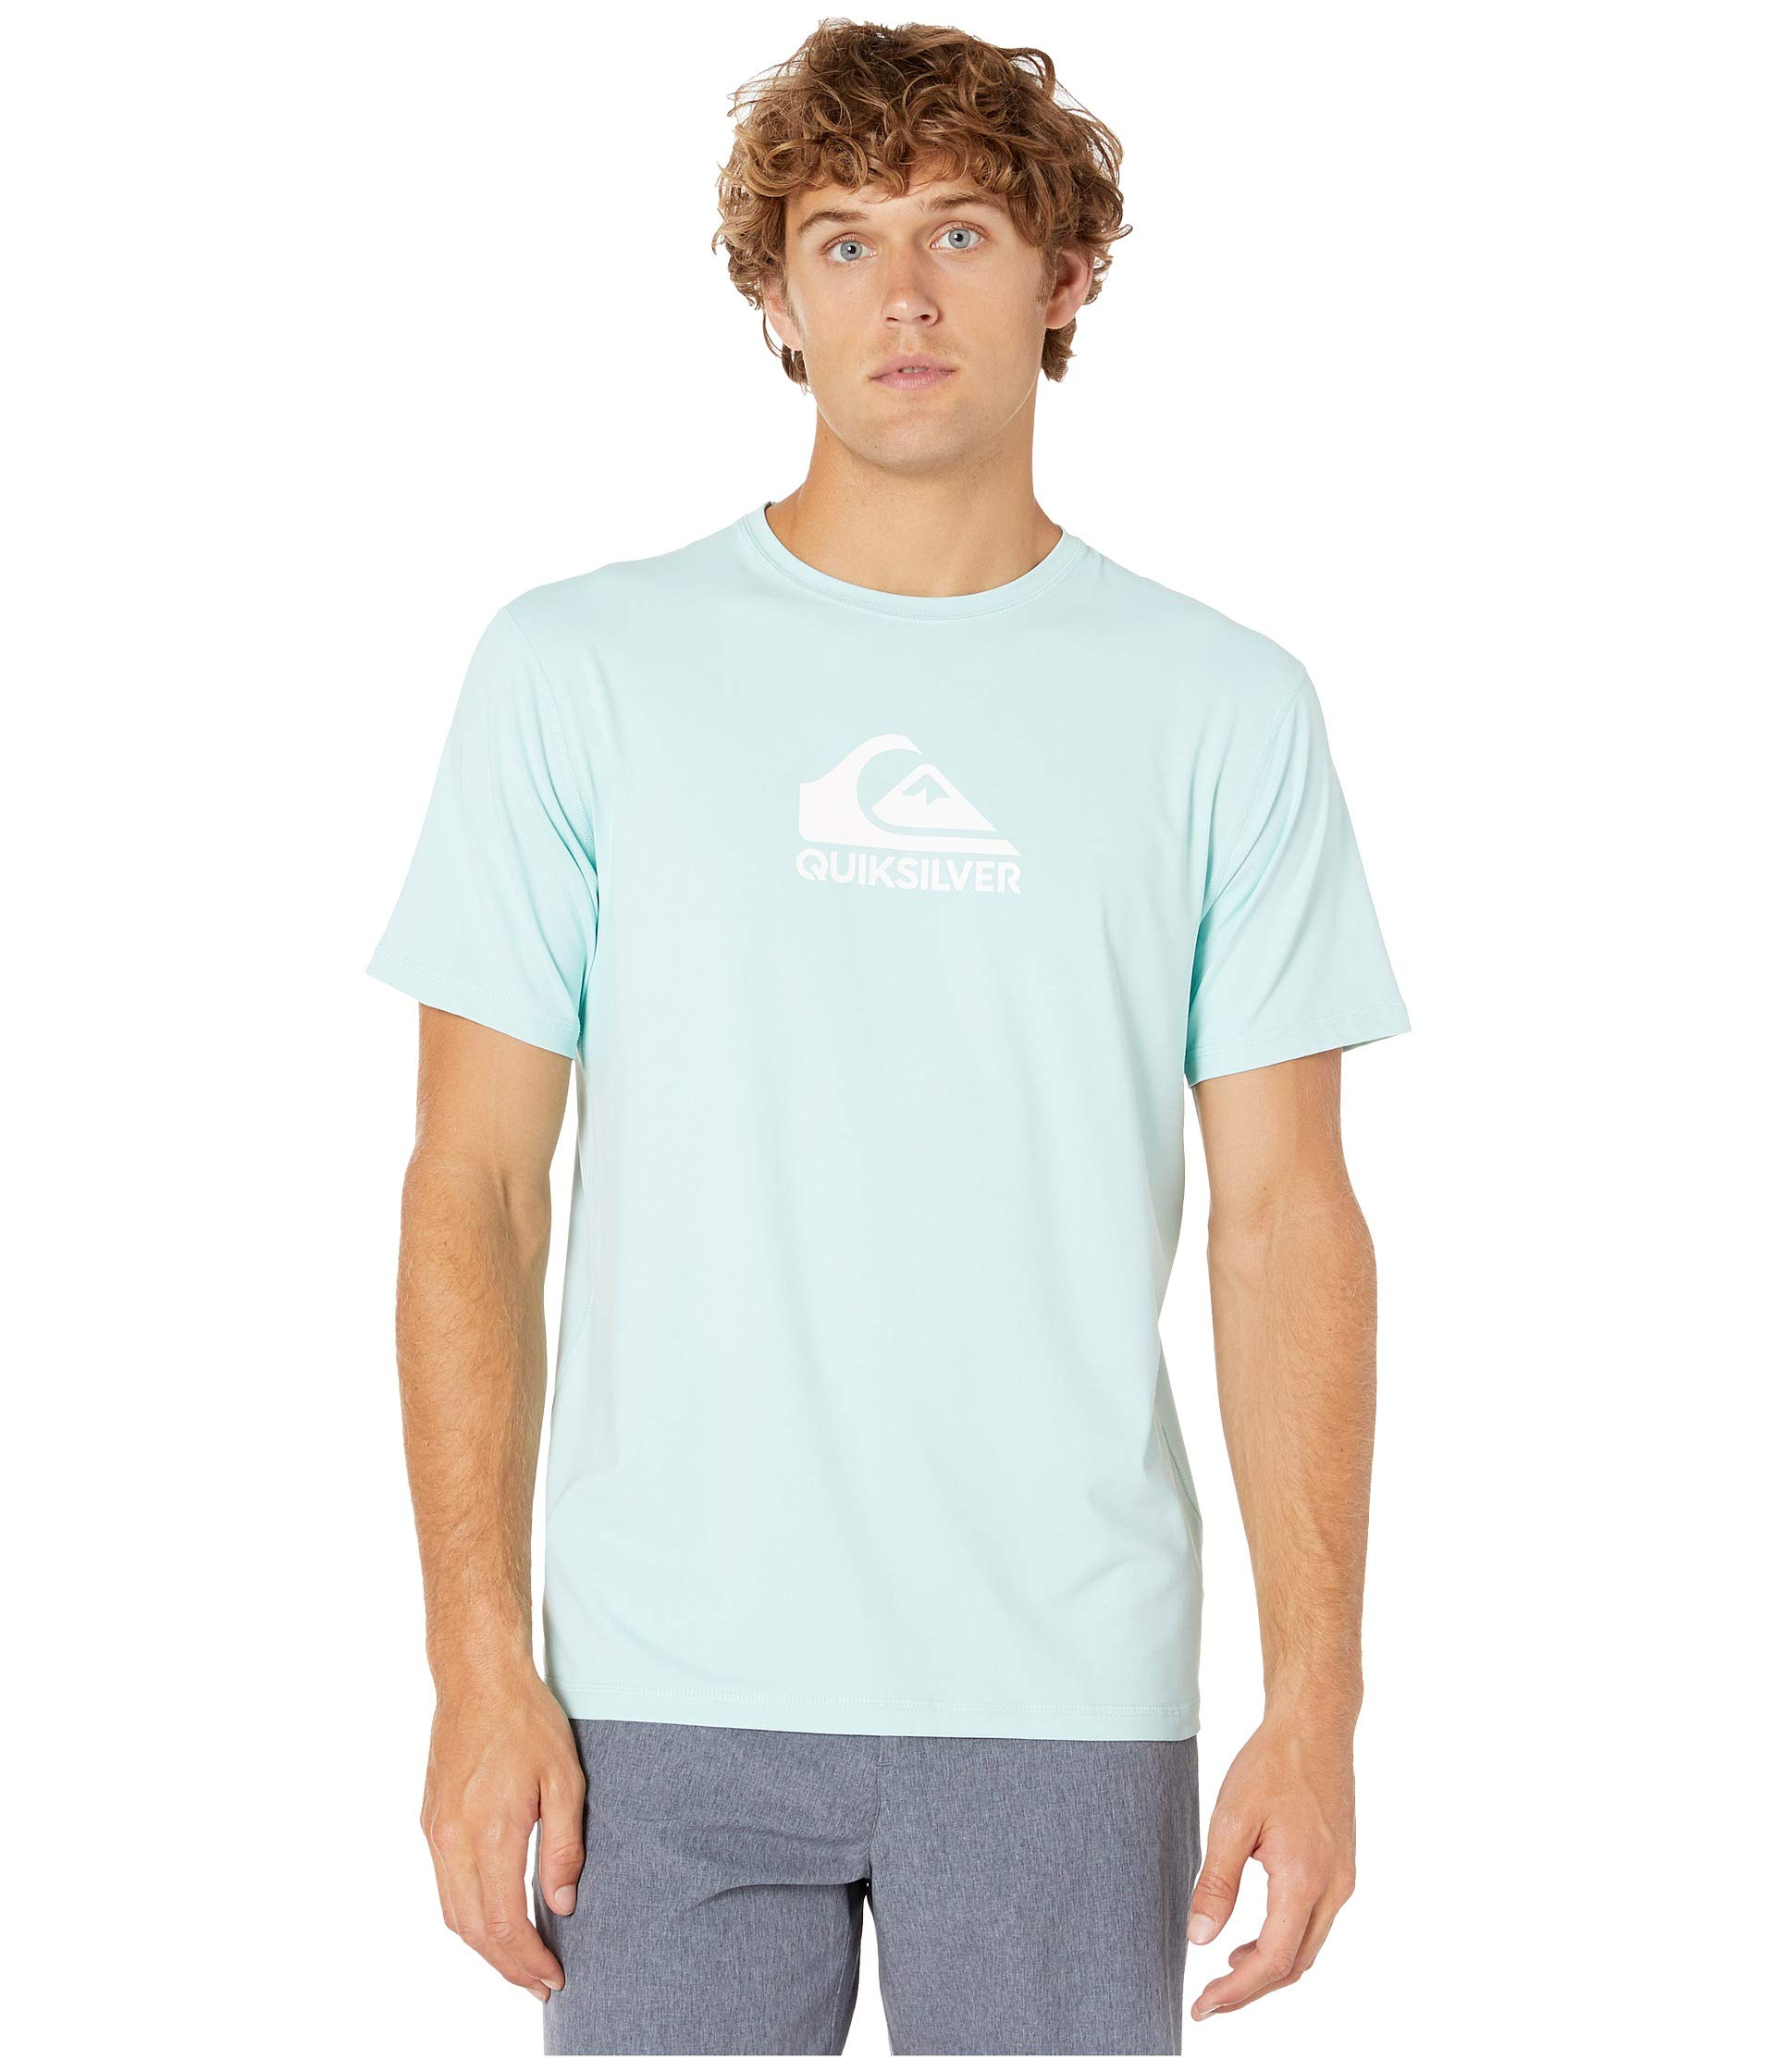 Quiksilver Men's Solid Streak Short Sleeve Rashguard Pastel Turquoise Small